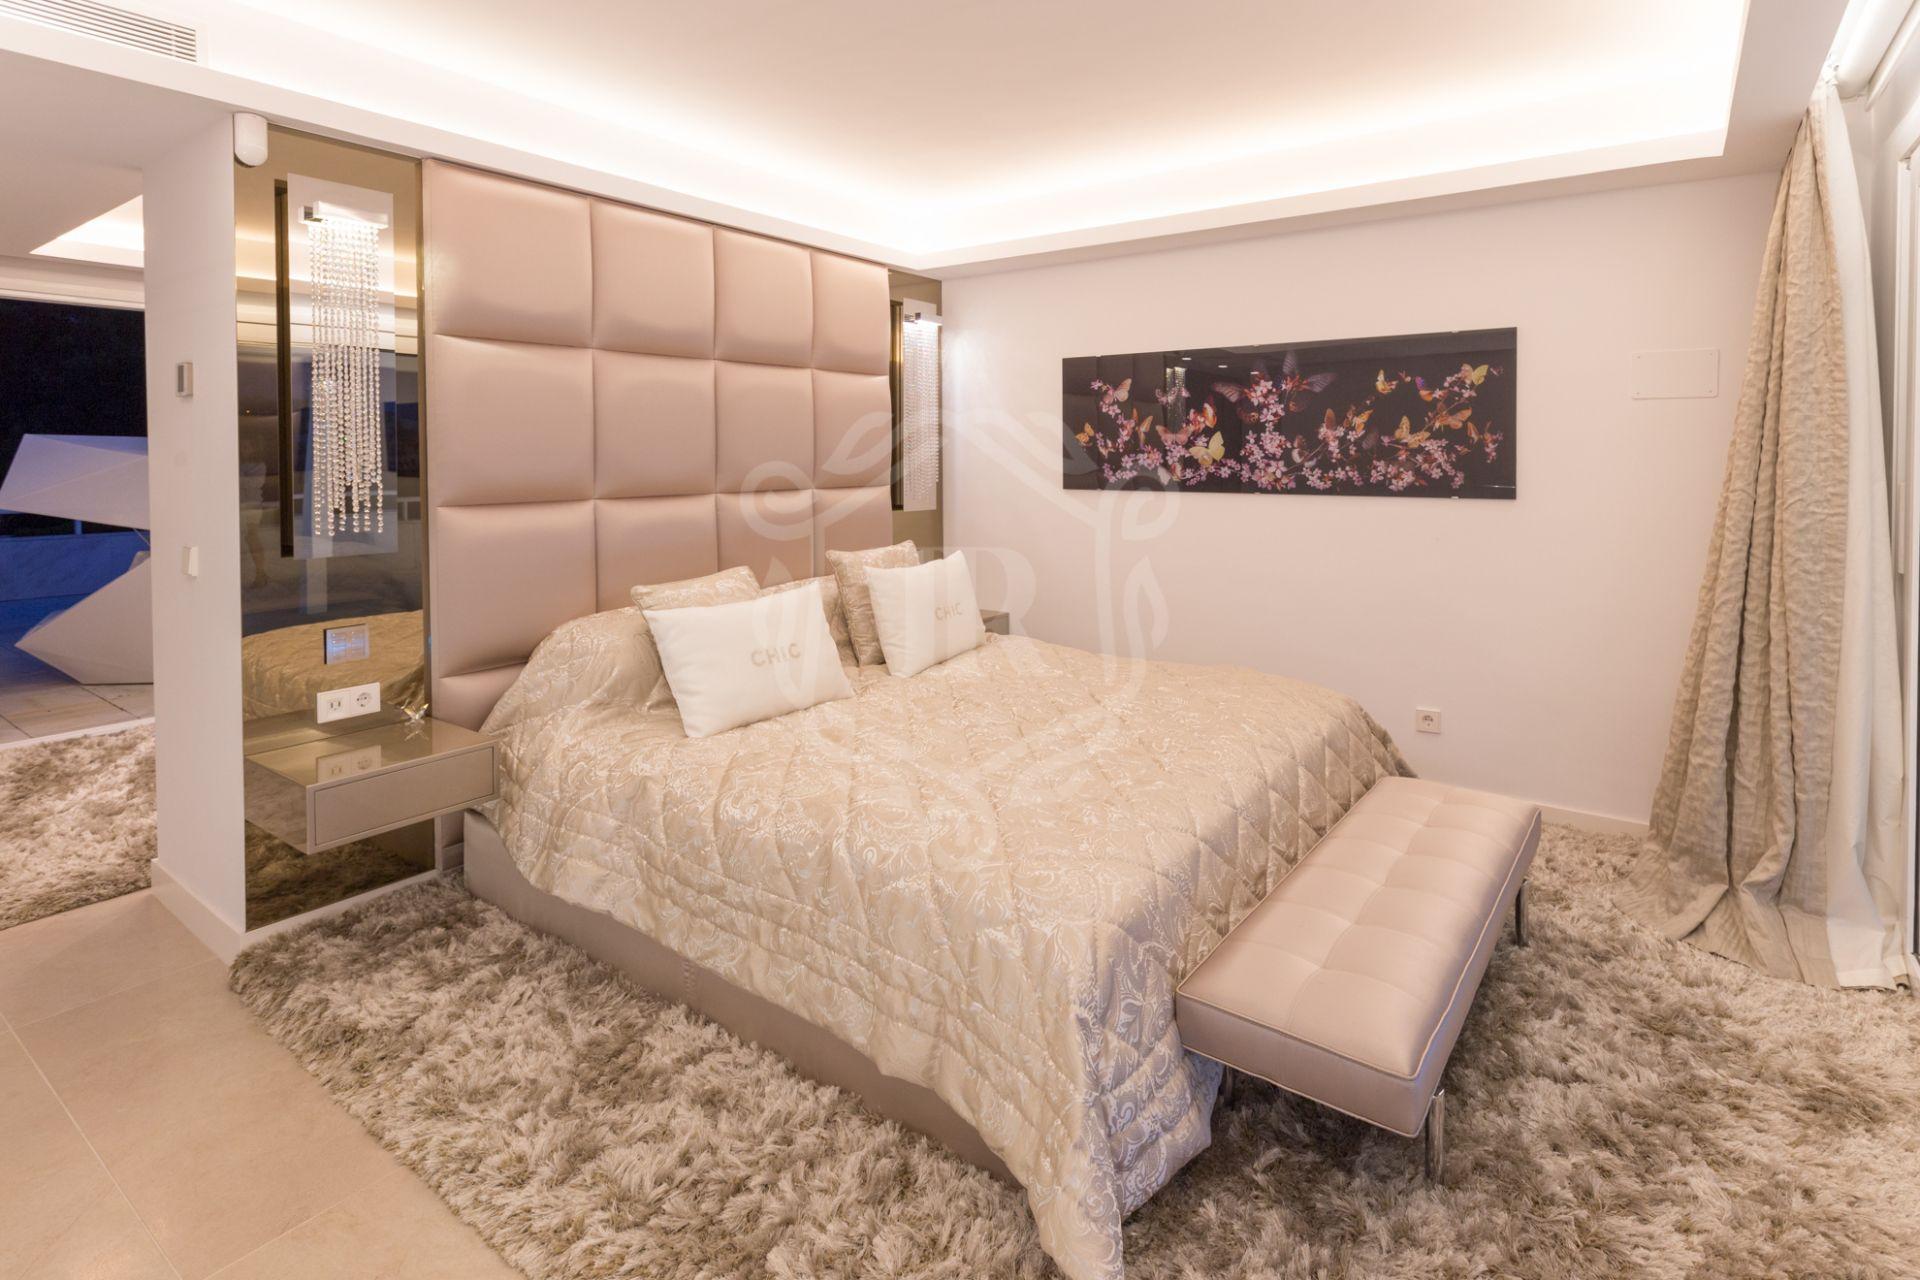 Duplex Penthouse for sale in Los Granados Golf, Nueva Andalucia